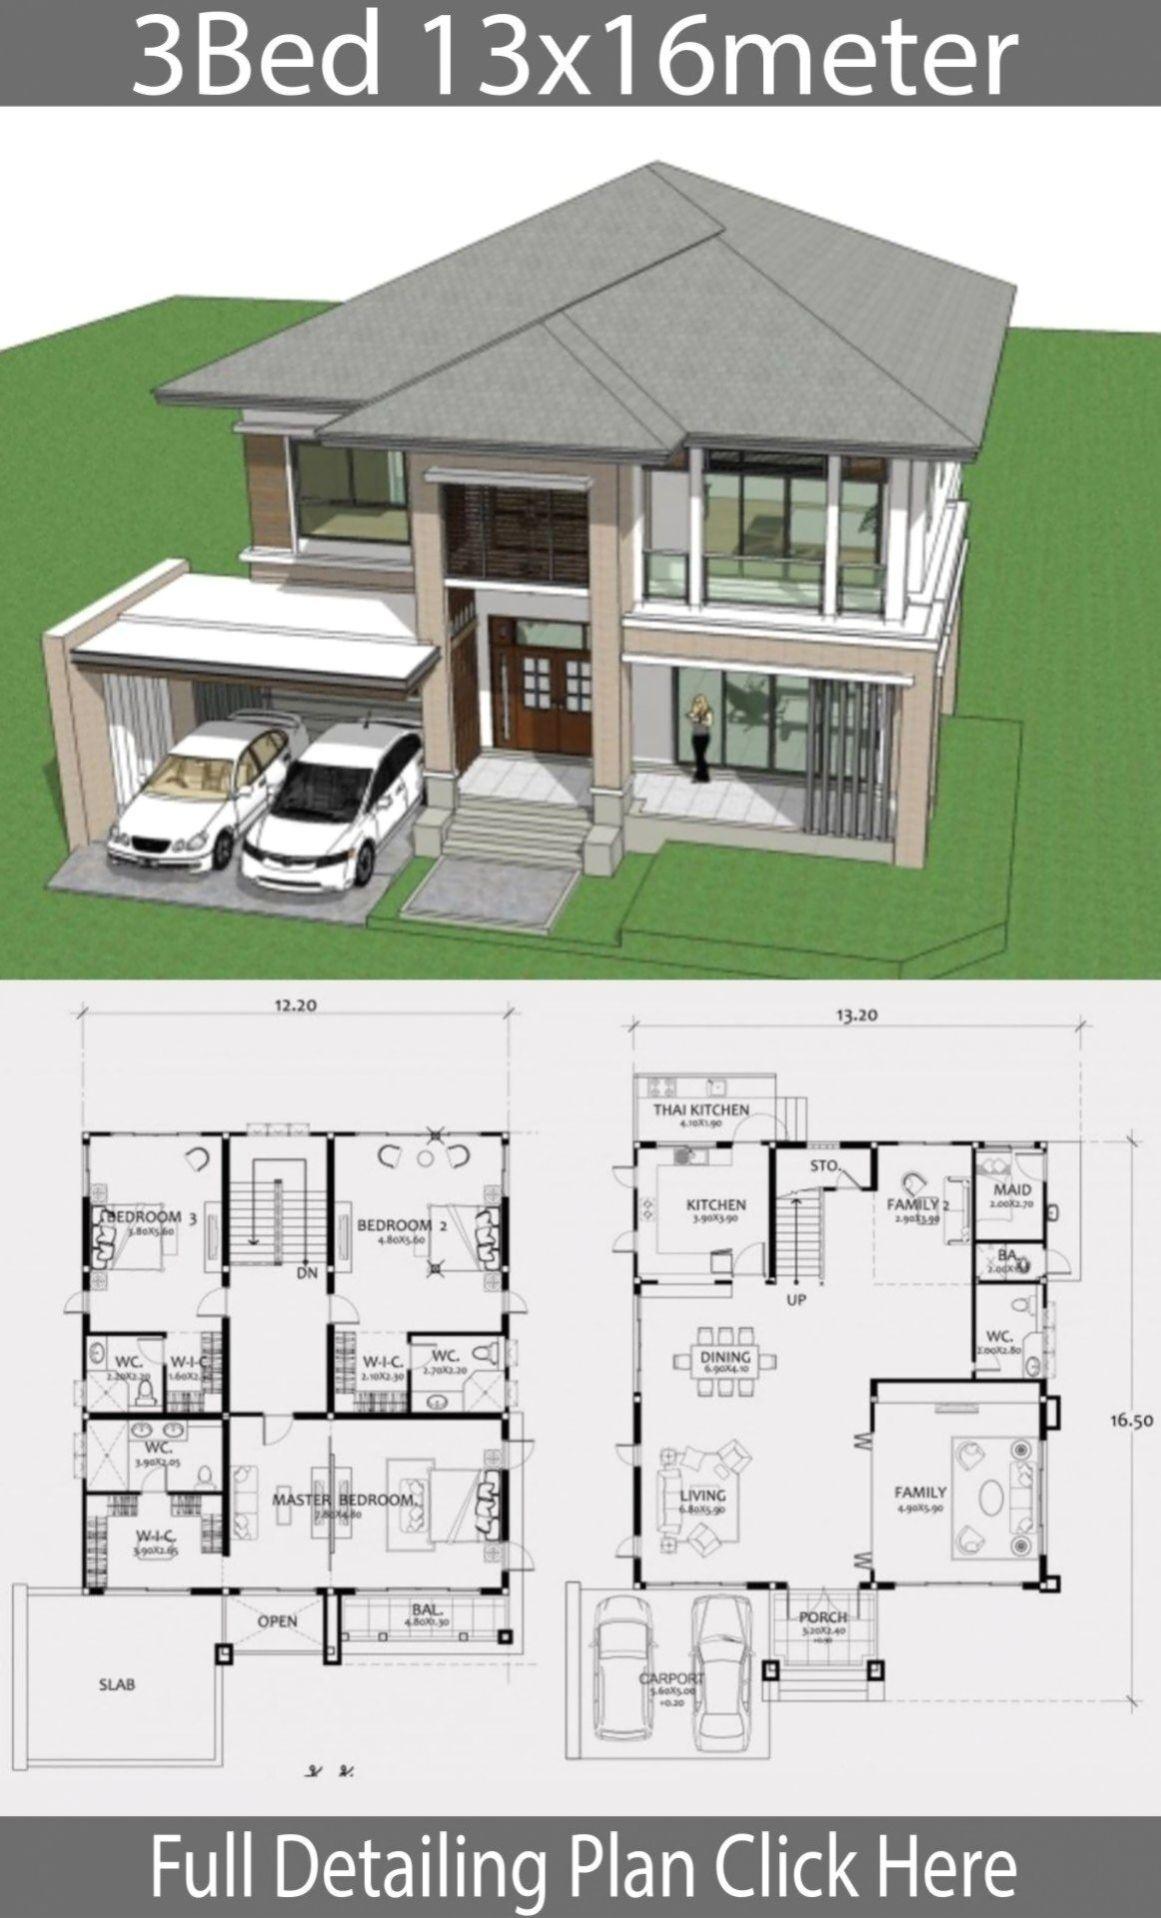 Home Design Plan Xm Mit 3 Schlafzimmern P E Arsitektur Rumah Denah Desain Rumah Denah Rumah